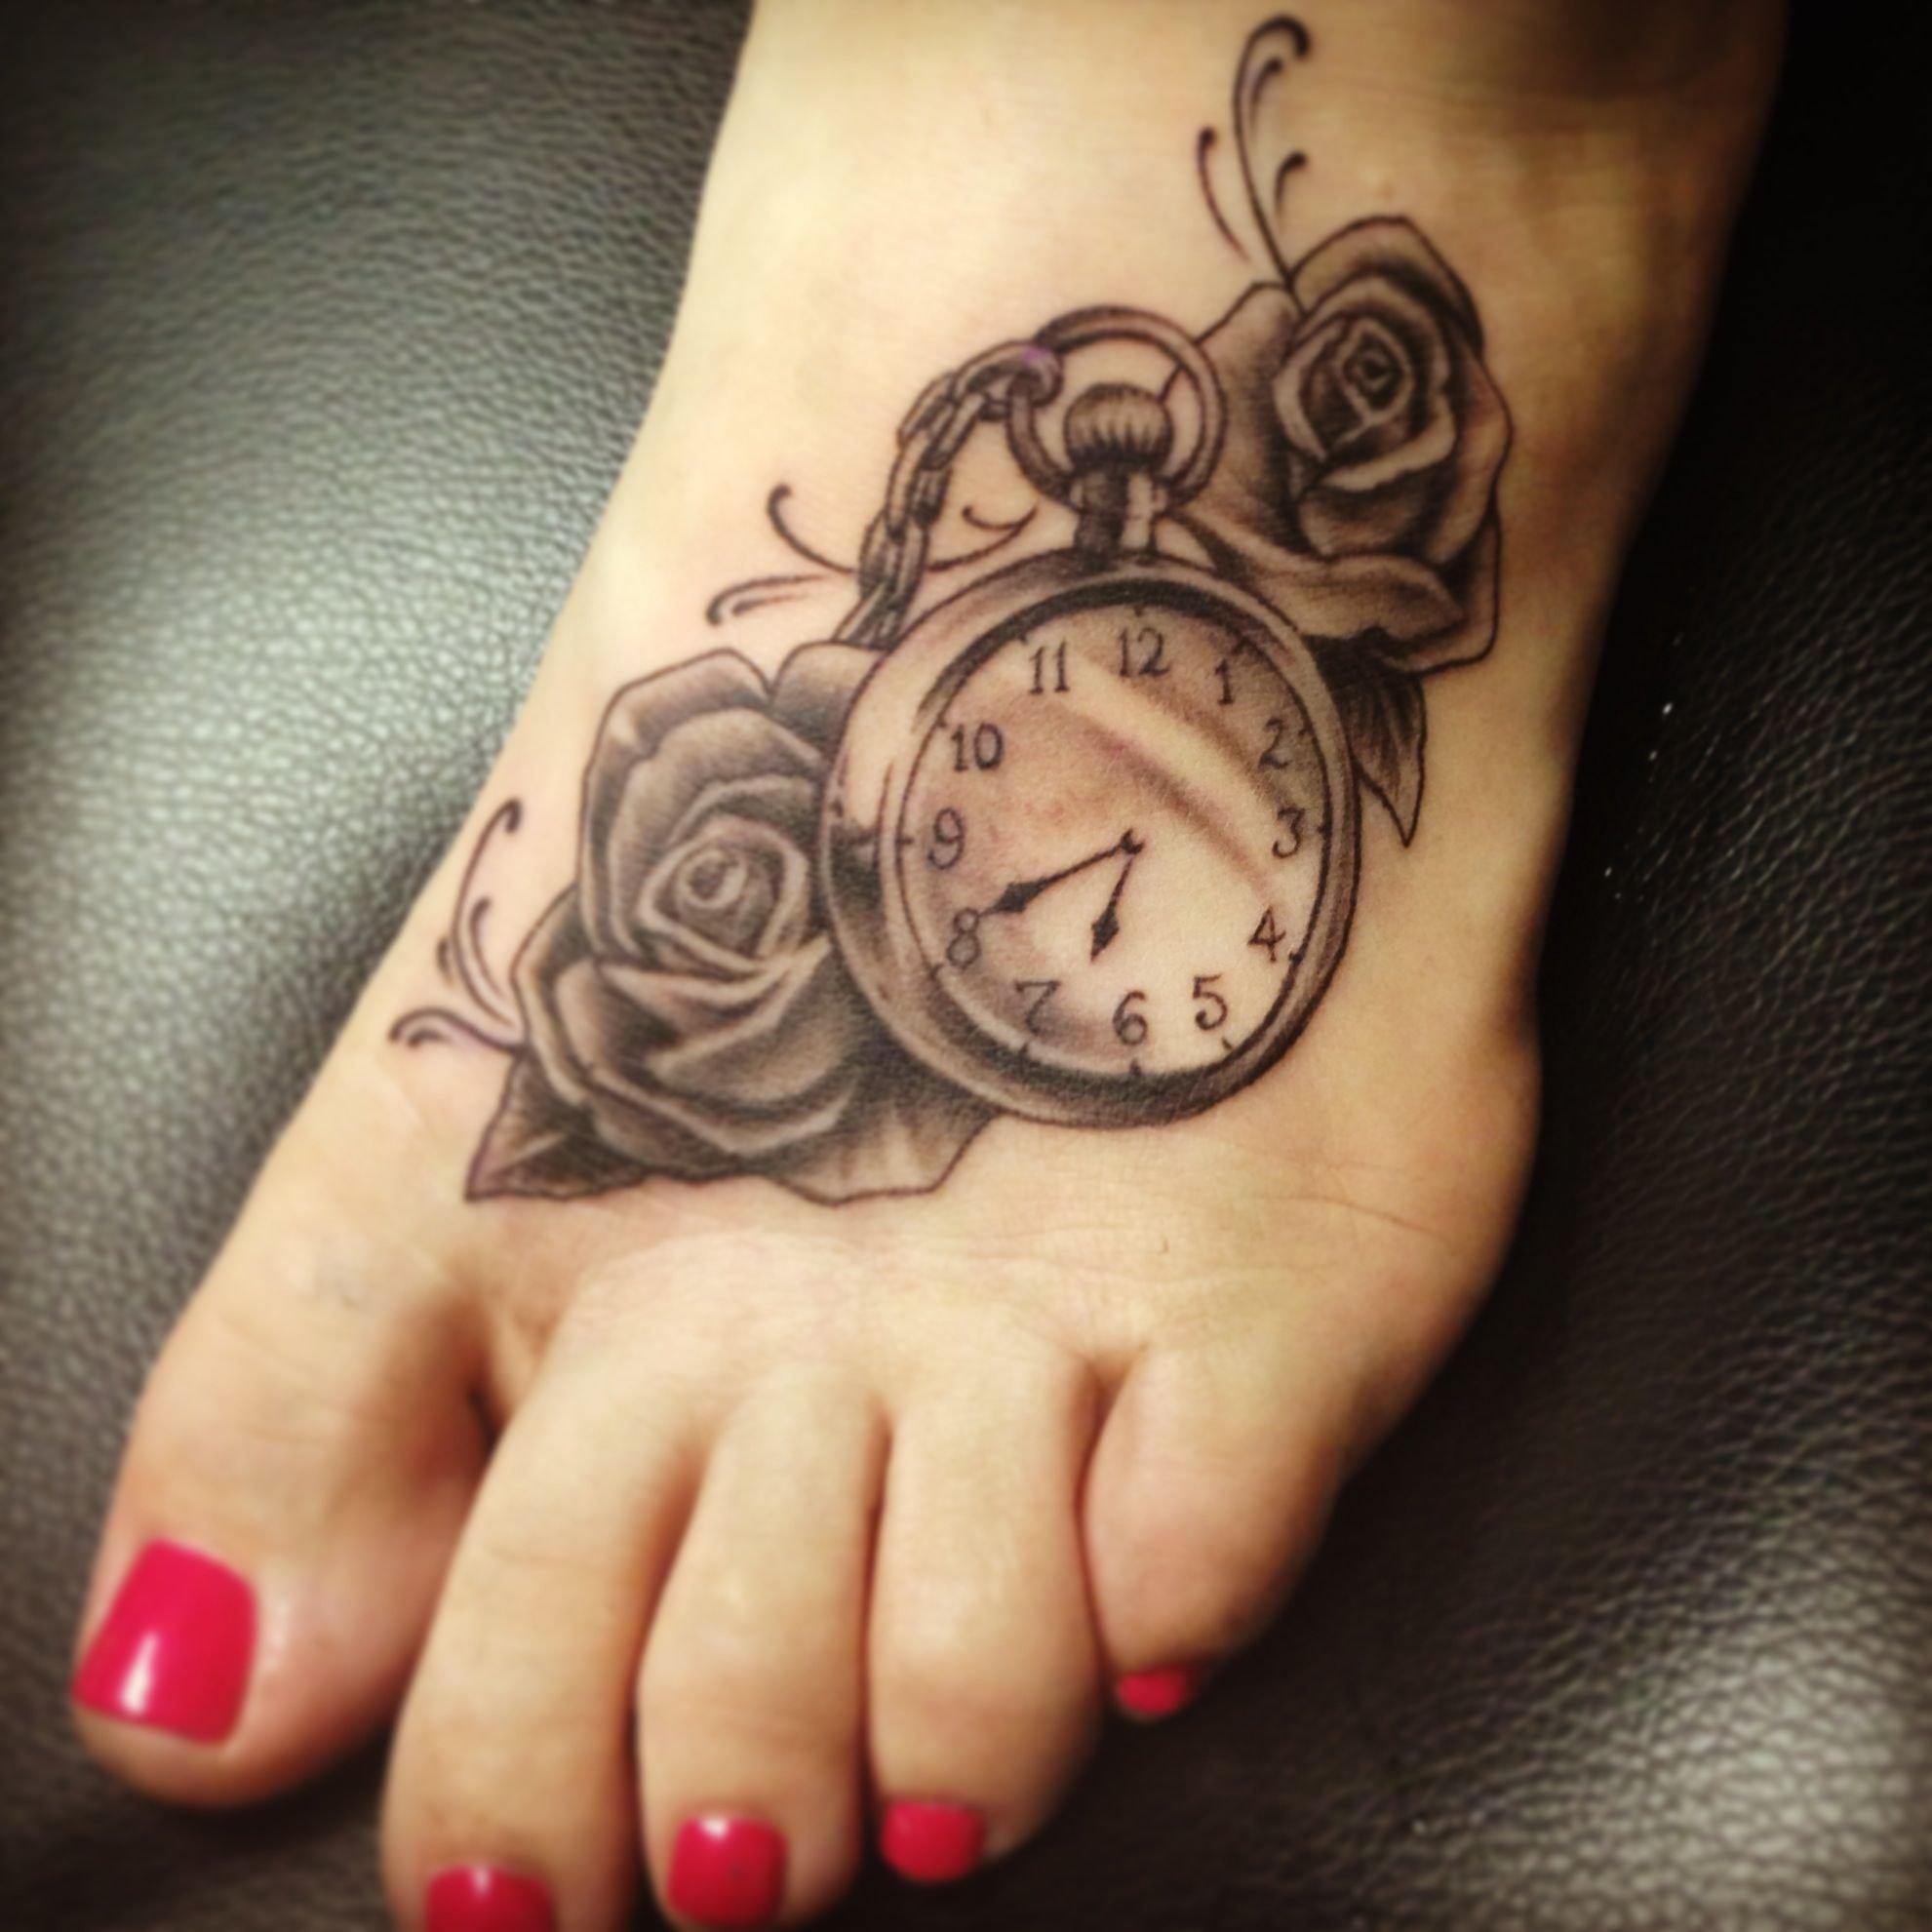 10 Cute Foot Tattoo Cover Up Ideas 10 foot rose tattoo designs tattoo babies and tatting 1 2021